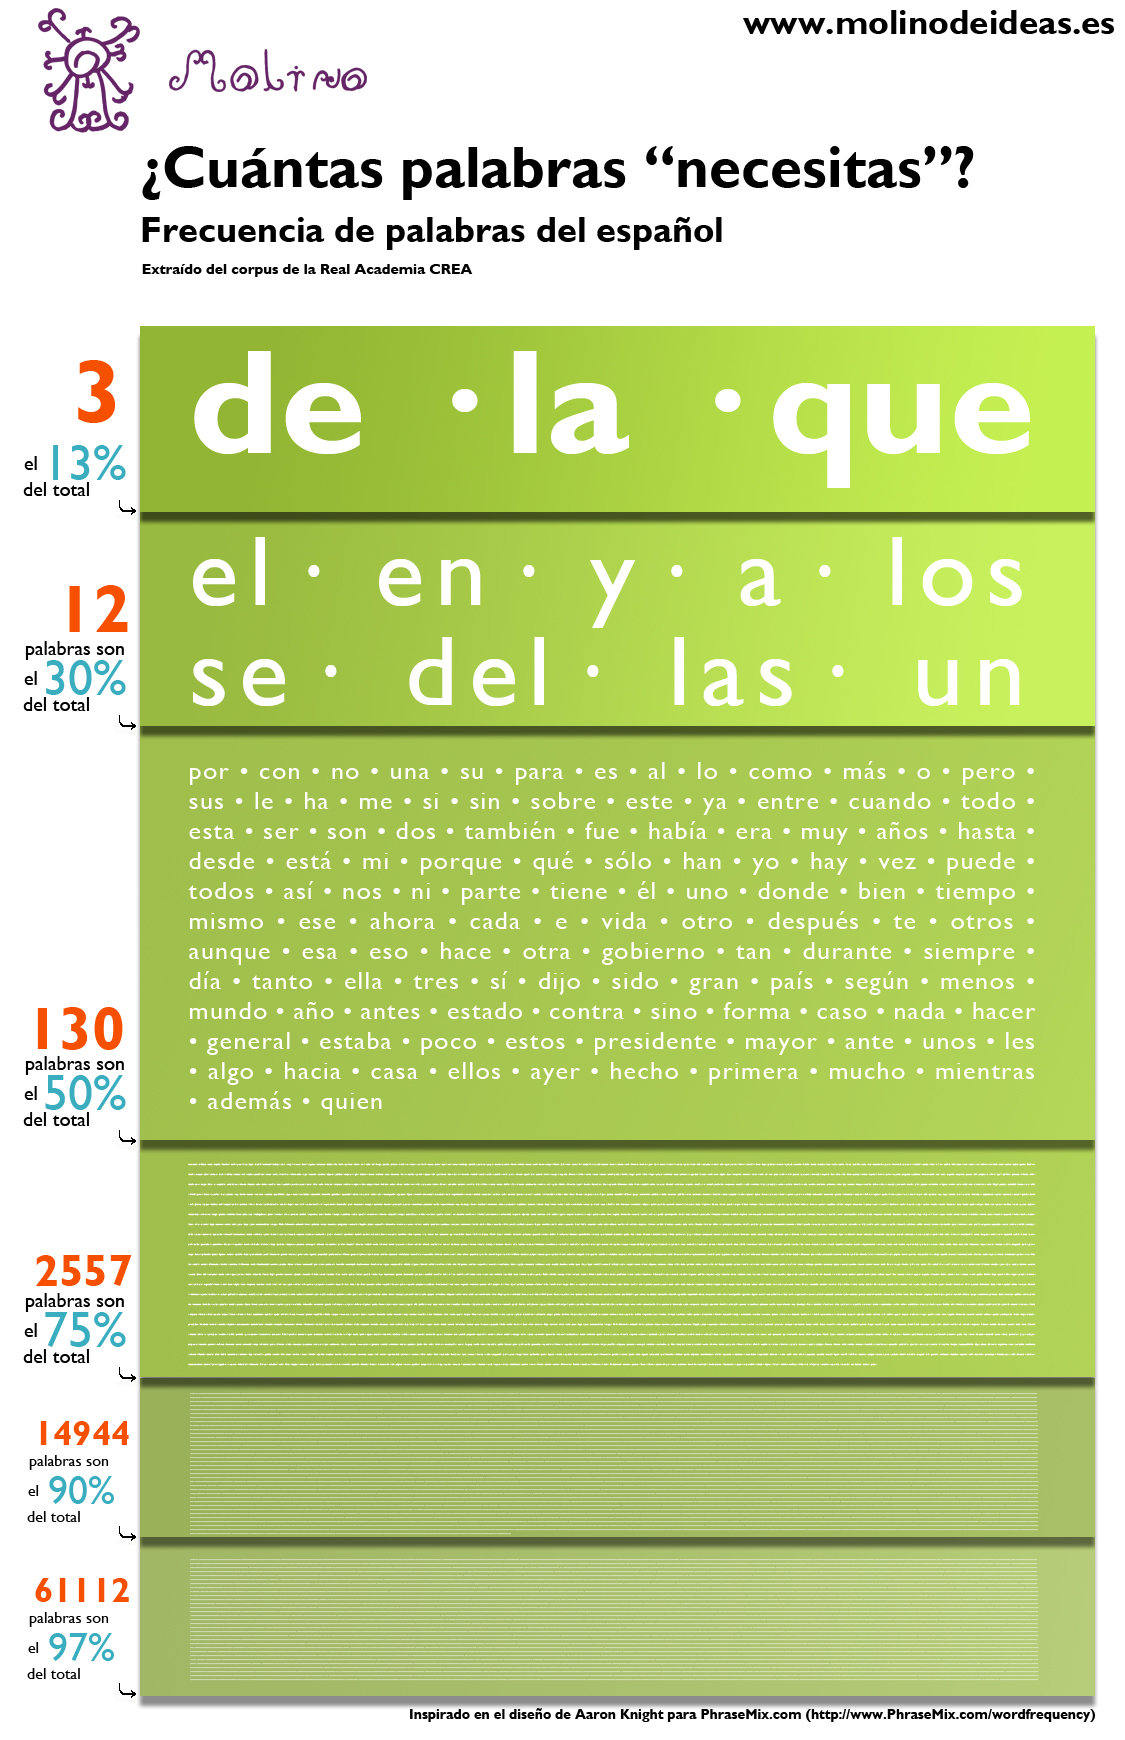 Las Palabras Mas Usadas Del Idioma Espanol Infografia Infographic Education